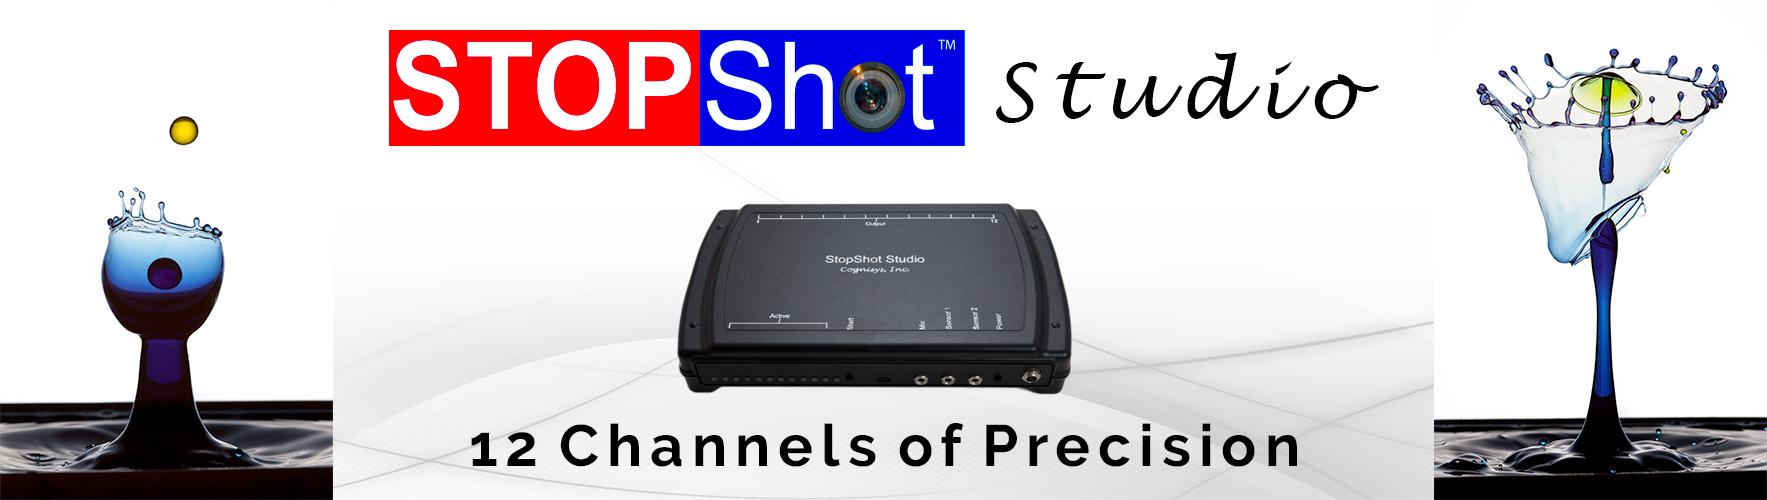 StopShot Studio 12 Channels of Precision